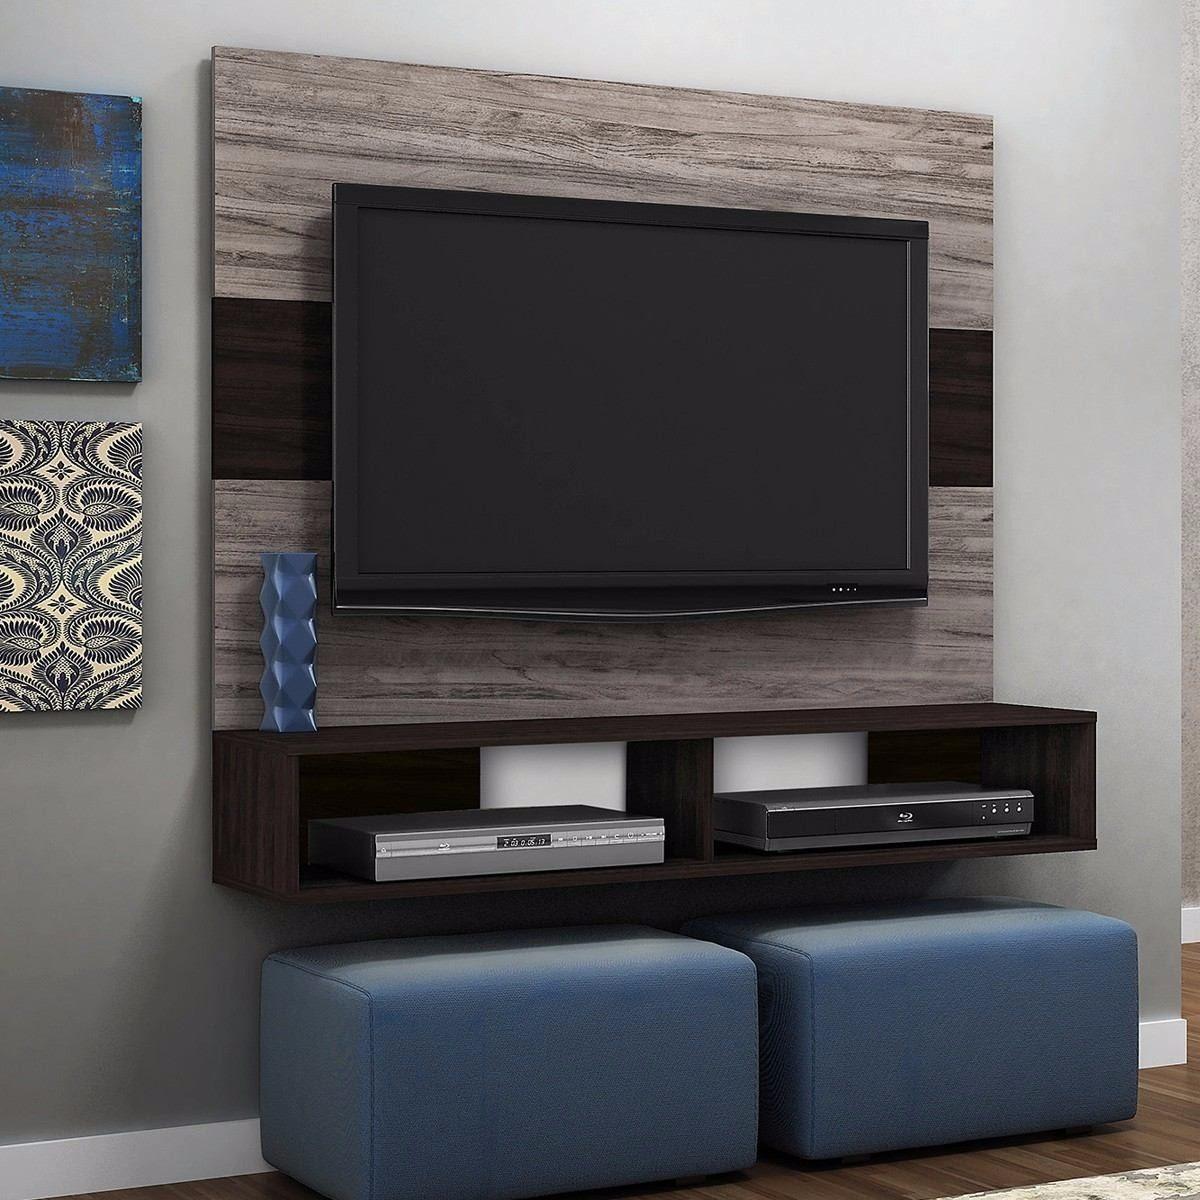 Mueble Rack Para Tv Centro De Entretenimiento Gratis